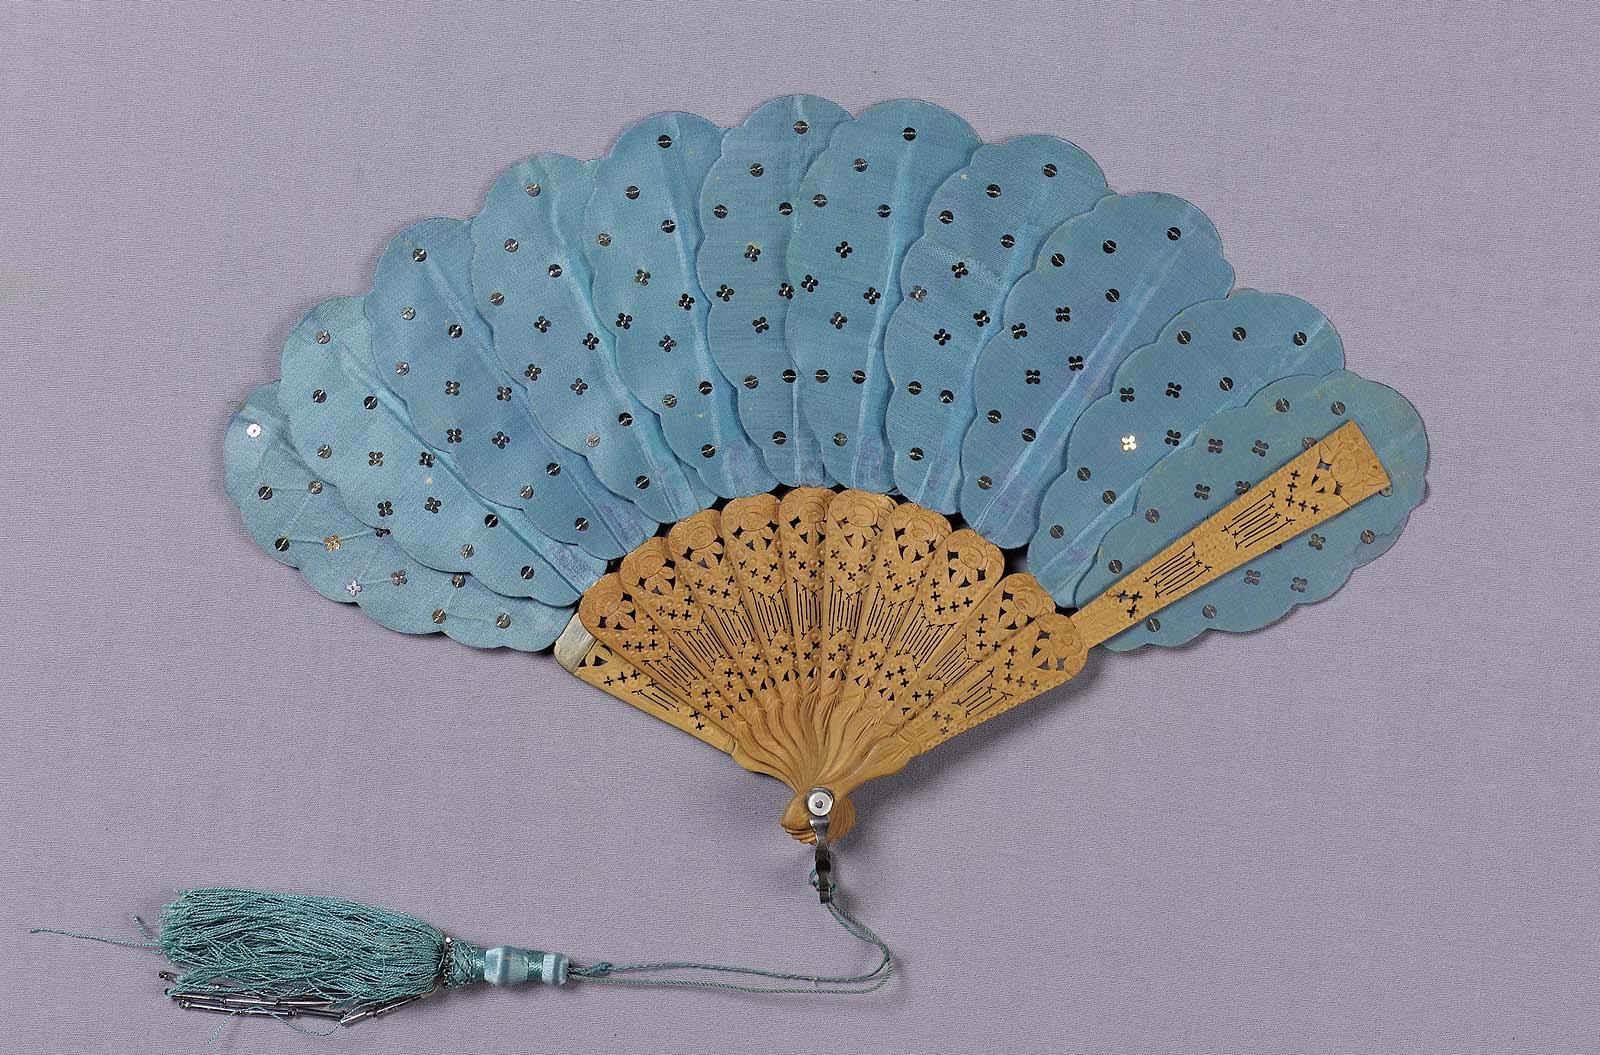 mid 19th century blue satin fan via mfa boston